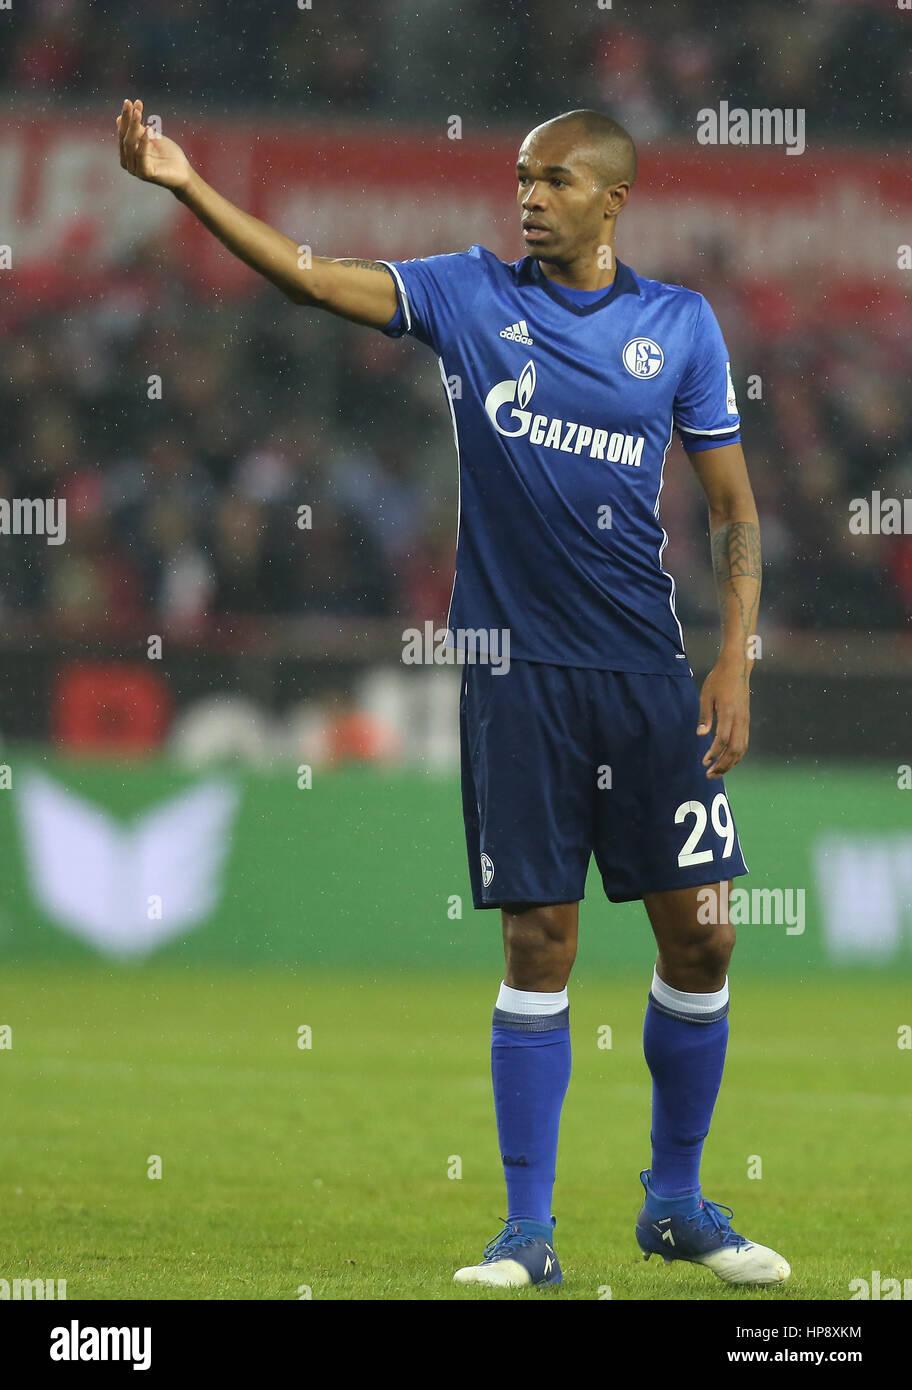 Cologne, Germany, February 19, 2017, Bundesliga matchday 21, 1. FC Koeln - FC Schalke 04:  Naldo (Schalke) gestures - Stock Image